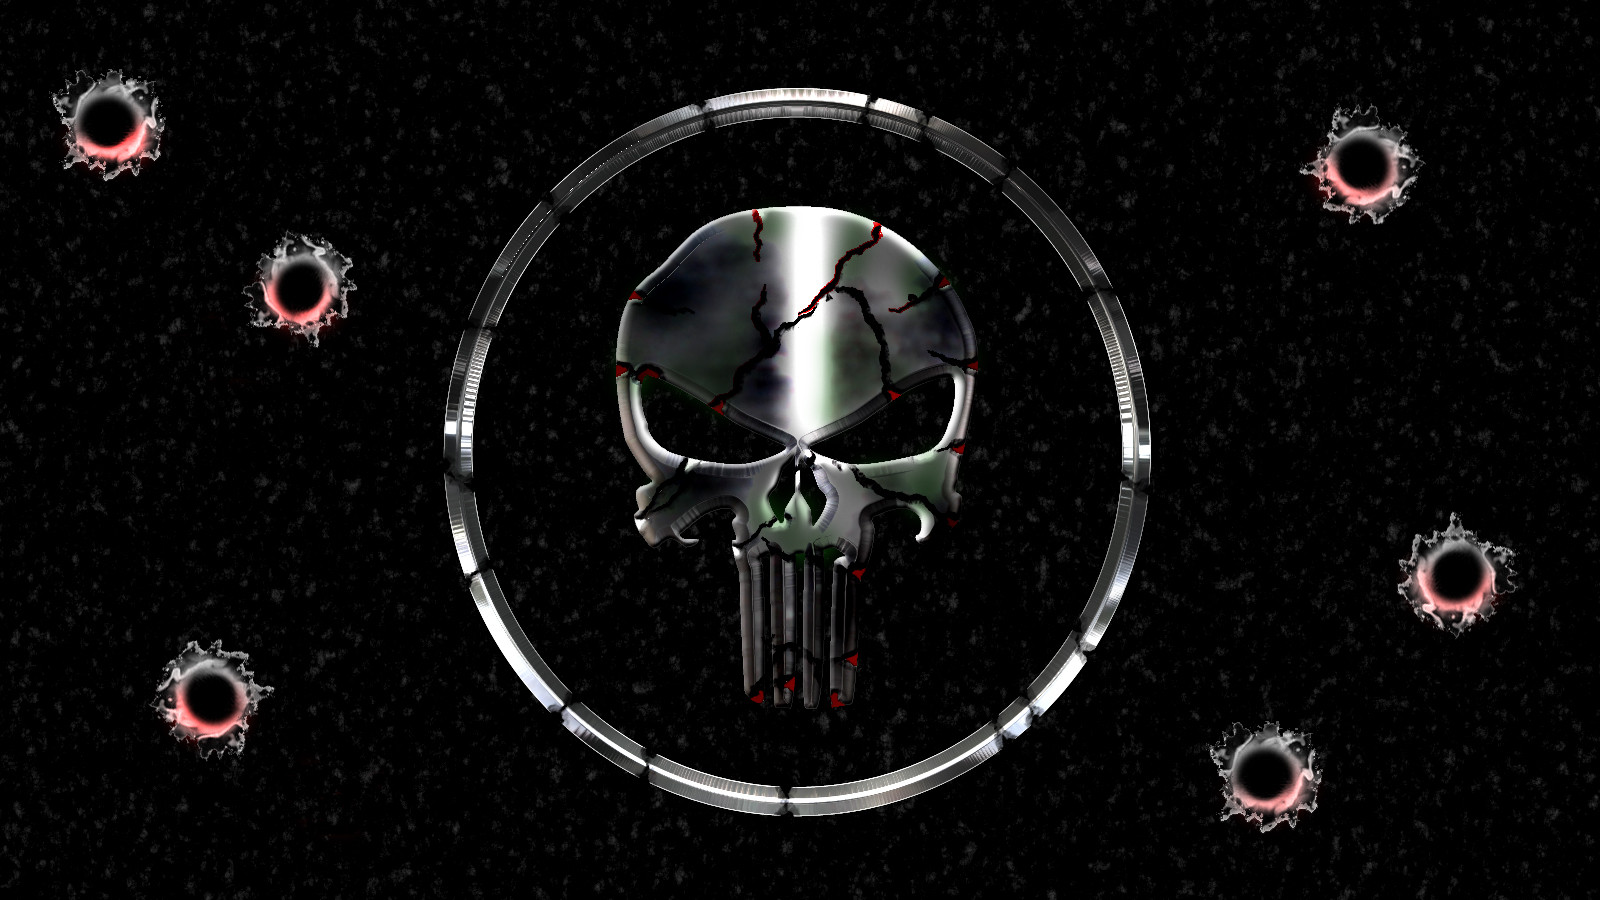 The Punisher Skull Wallpaper - WallpaperSafari